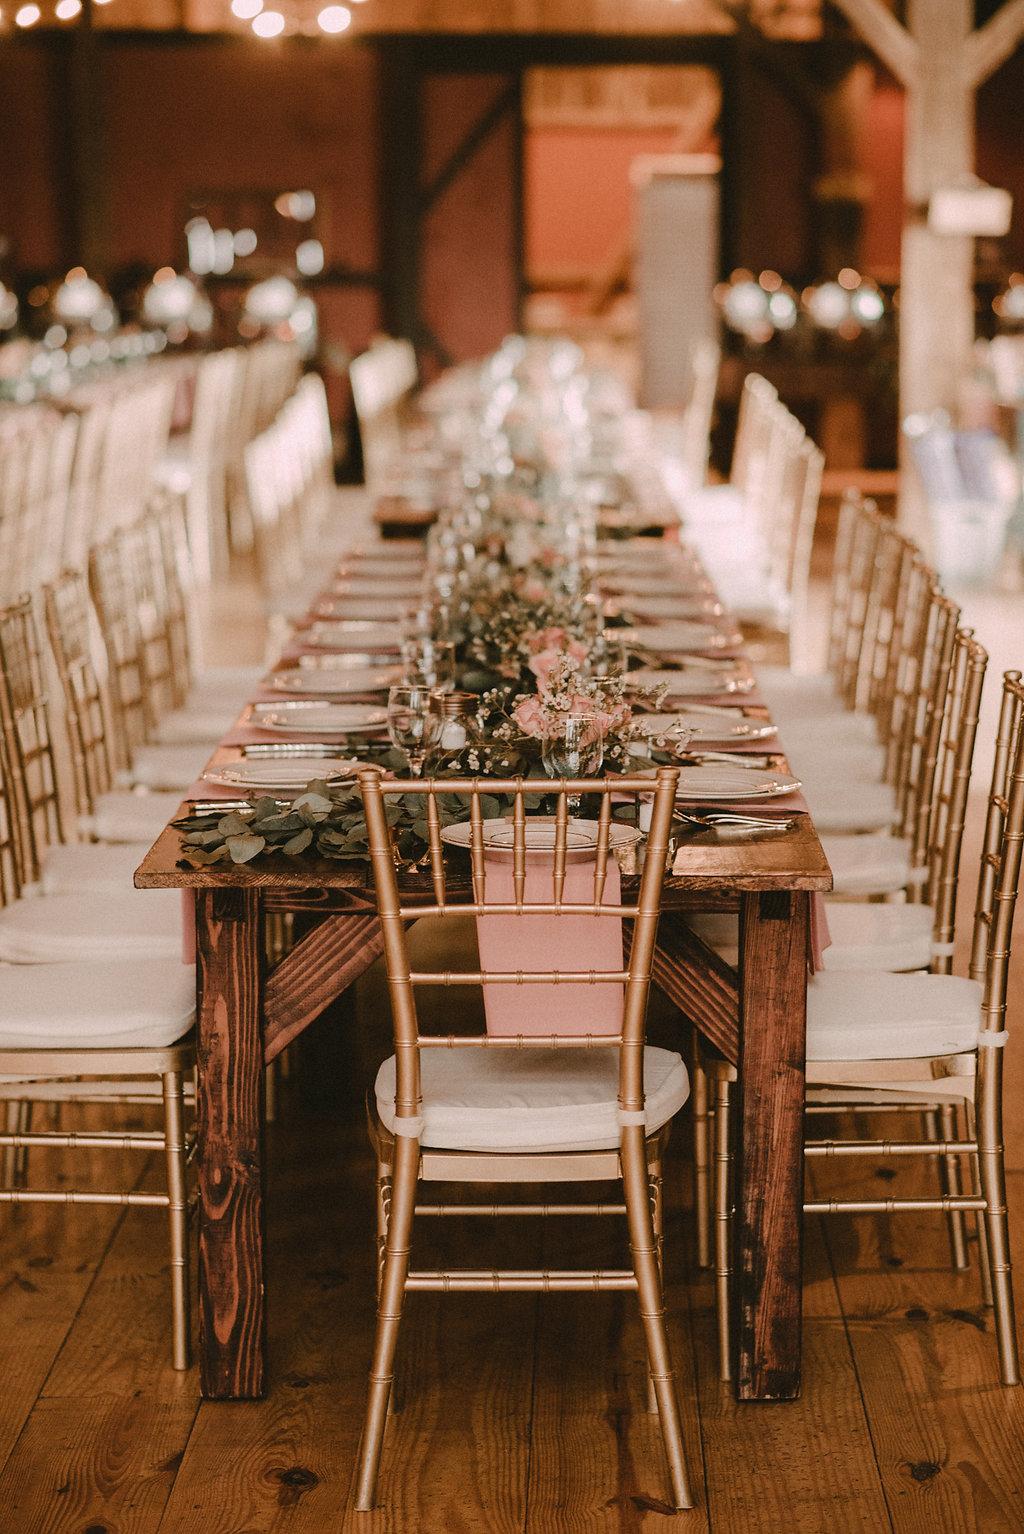 rustic table setting decor at riverside on the Potomac wedding photo